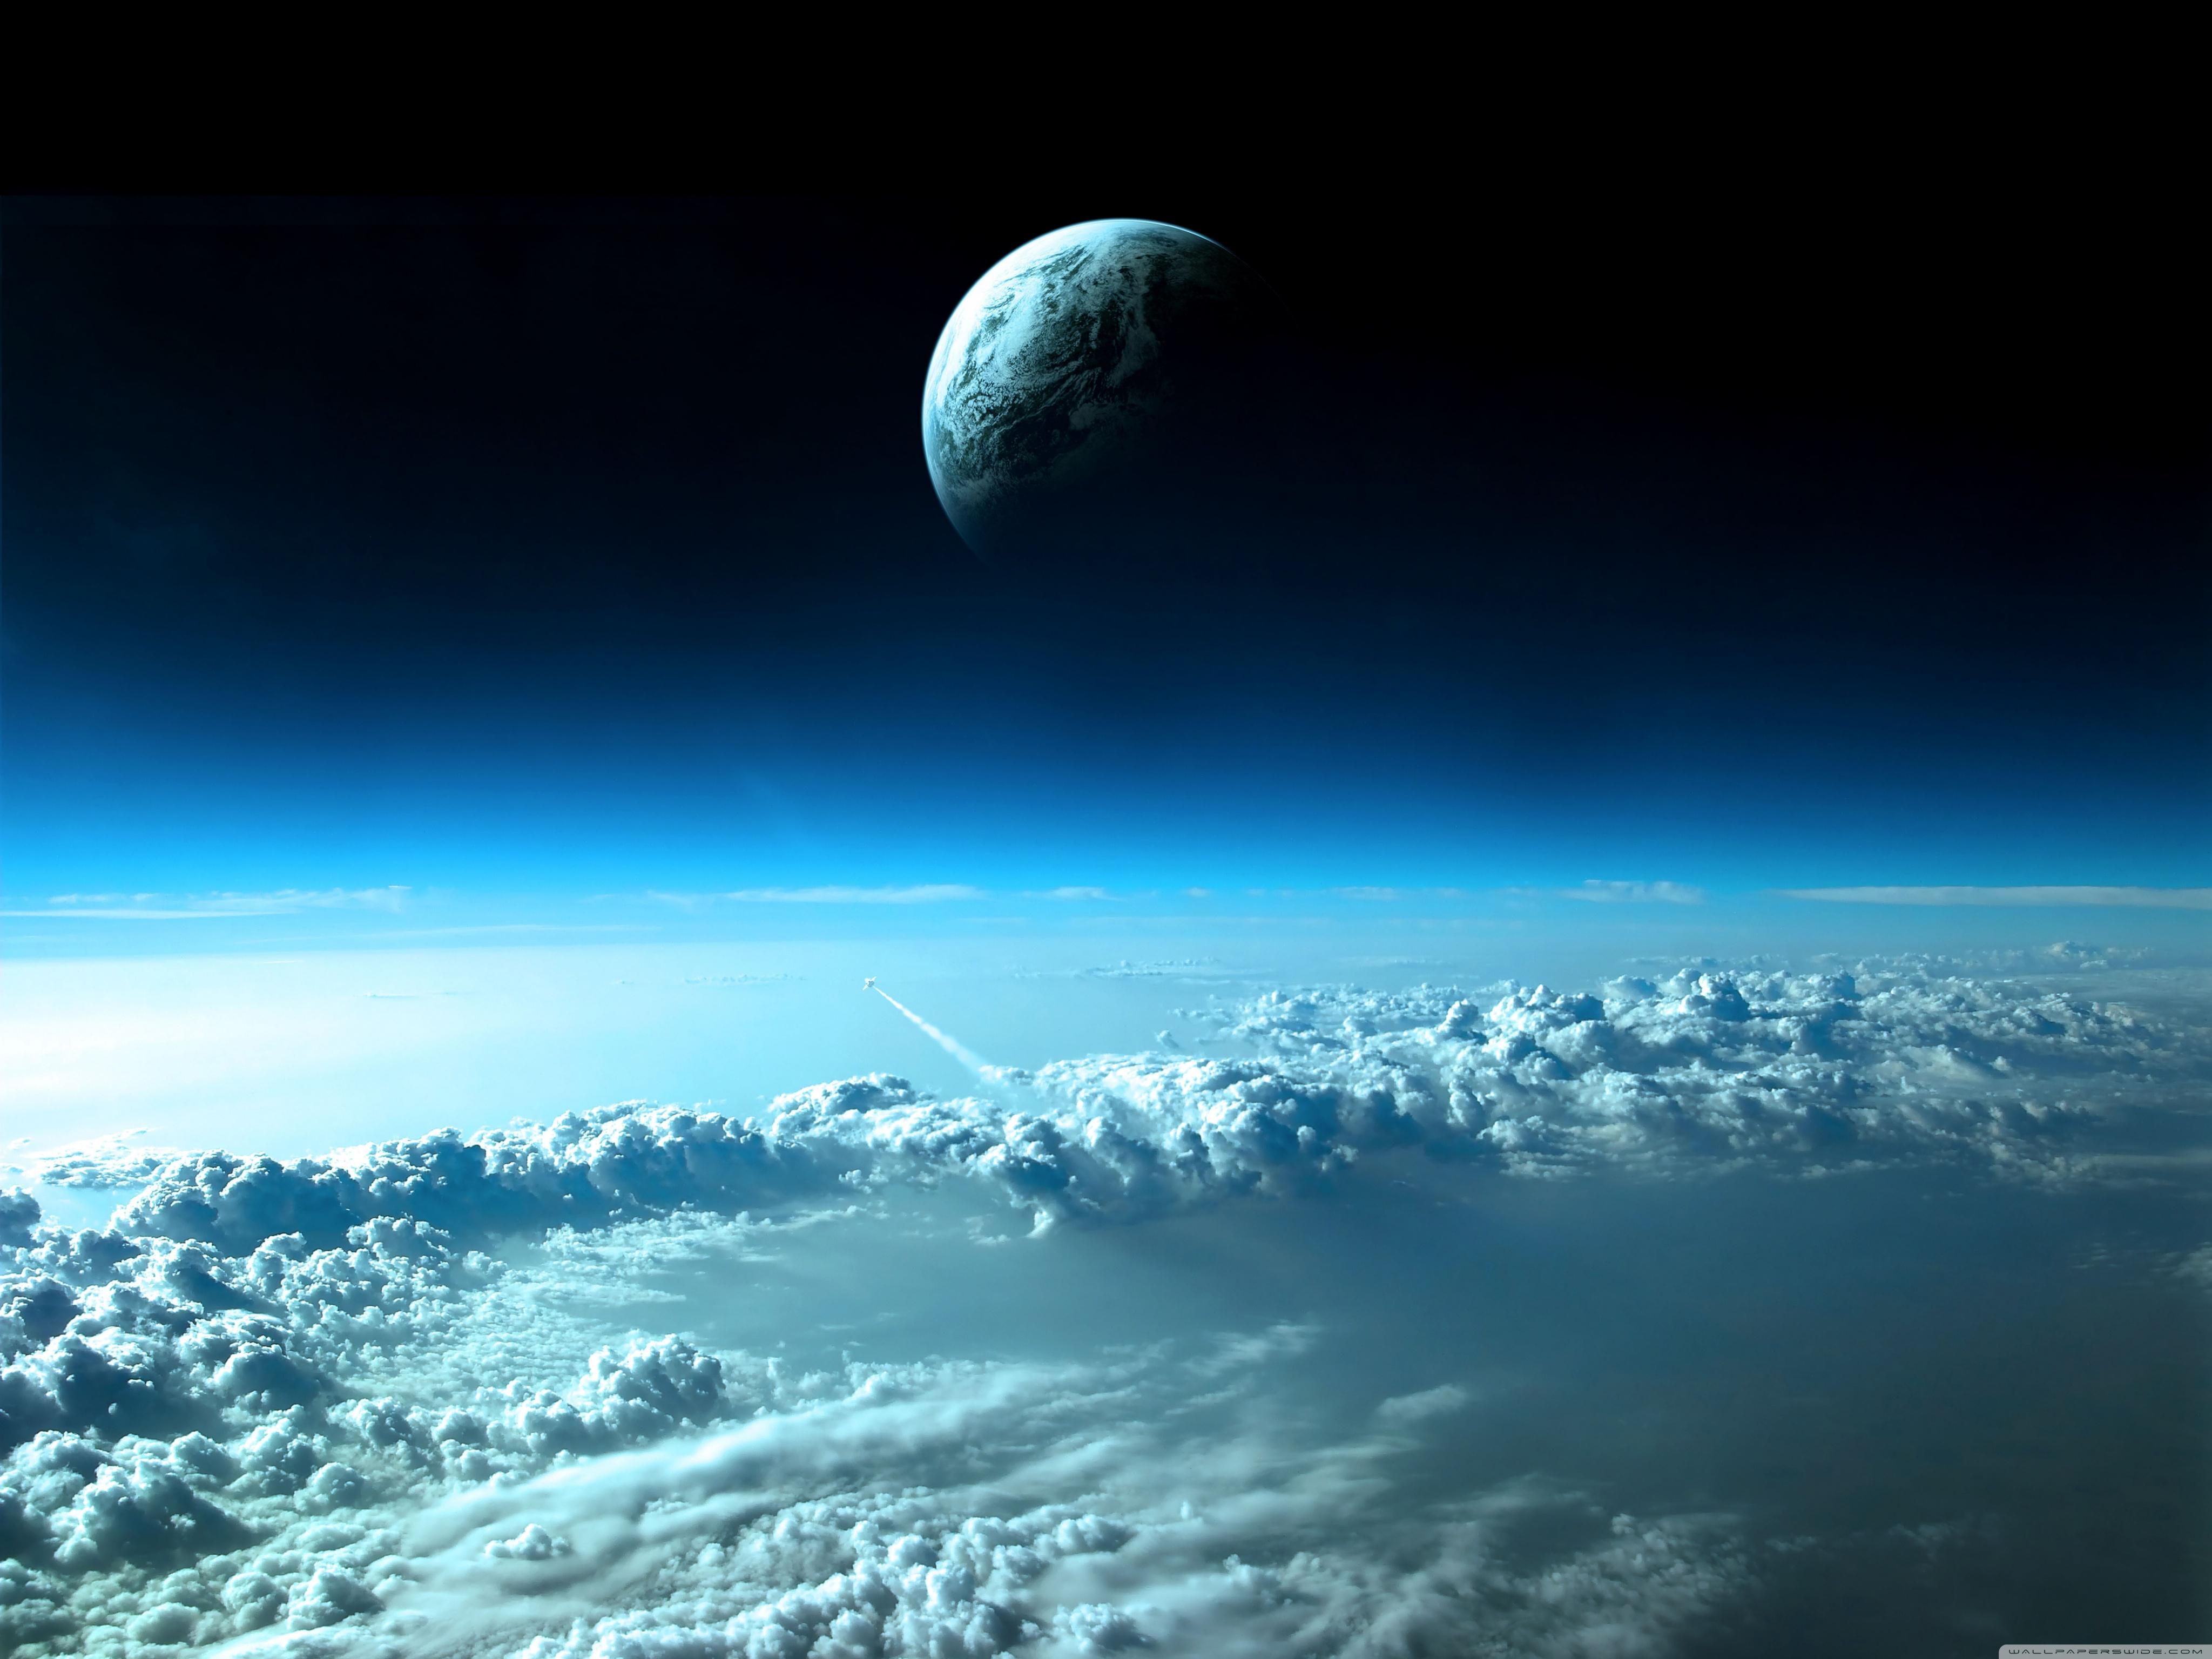 Beautiful Space View 4K Desktop Wallpaper Desktop Backgrounds 4096x3072